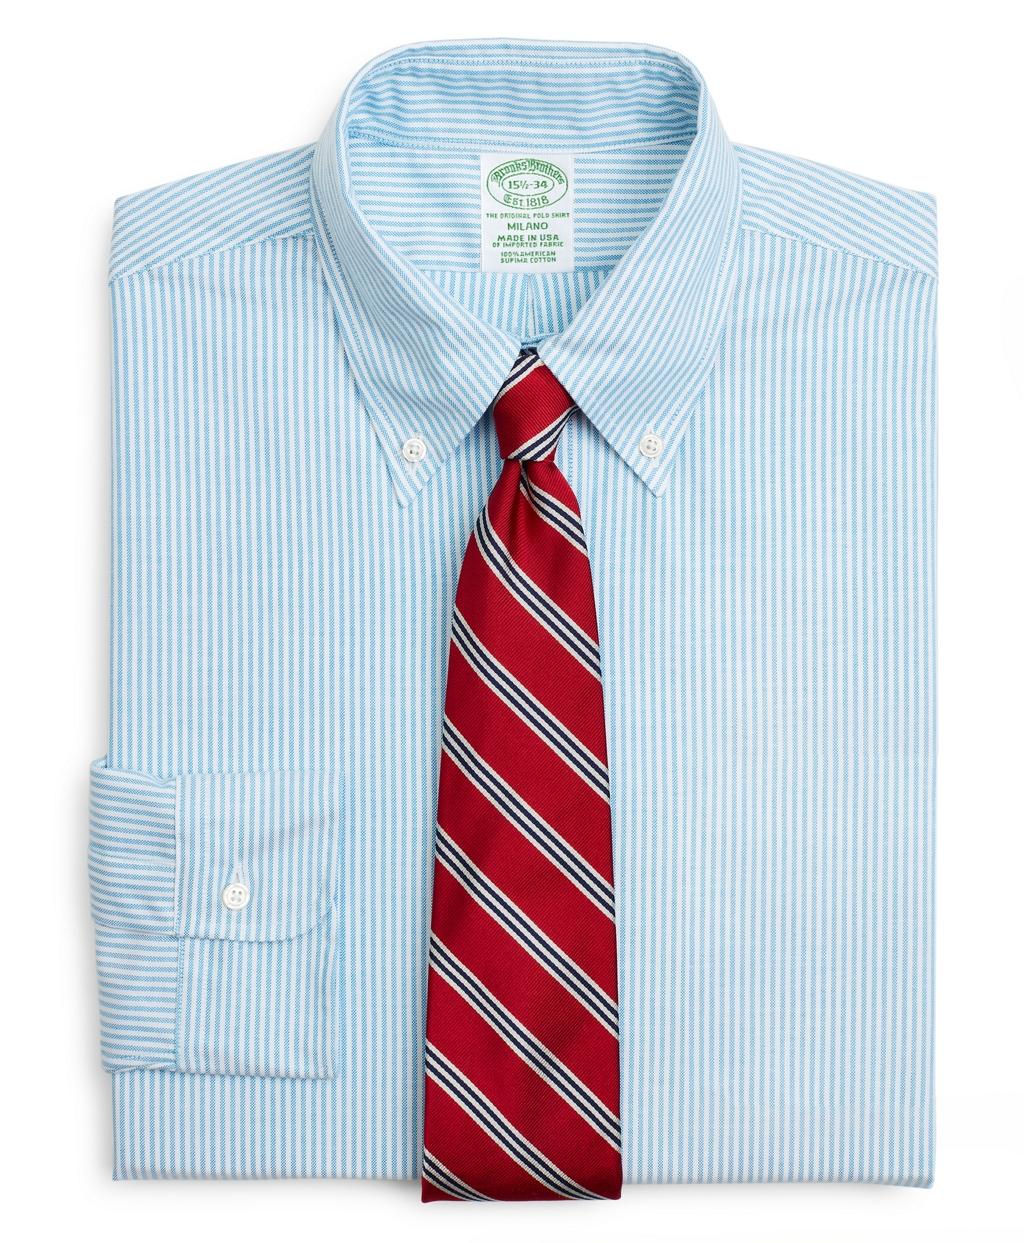 1920s Men's Dress Shirts Brooks Brothers Mens Original Polo Button-Down Oxford Extra Slim Slim-Fit Dress Shirt Stripe $140.00 AT vintagedancer.com